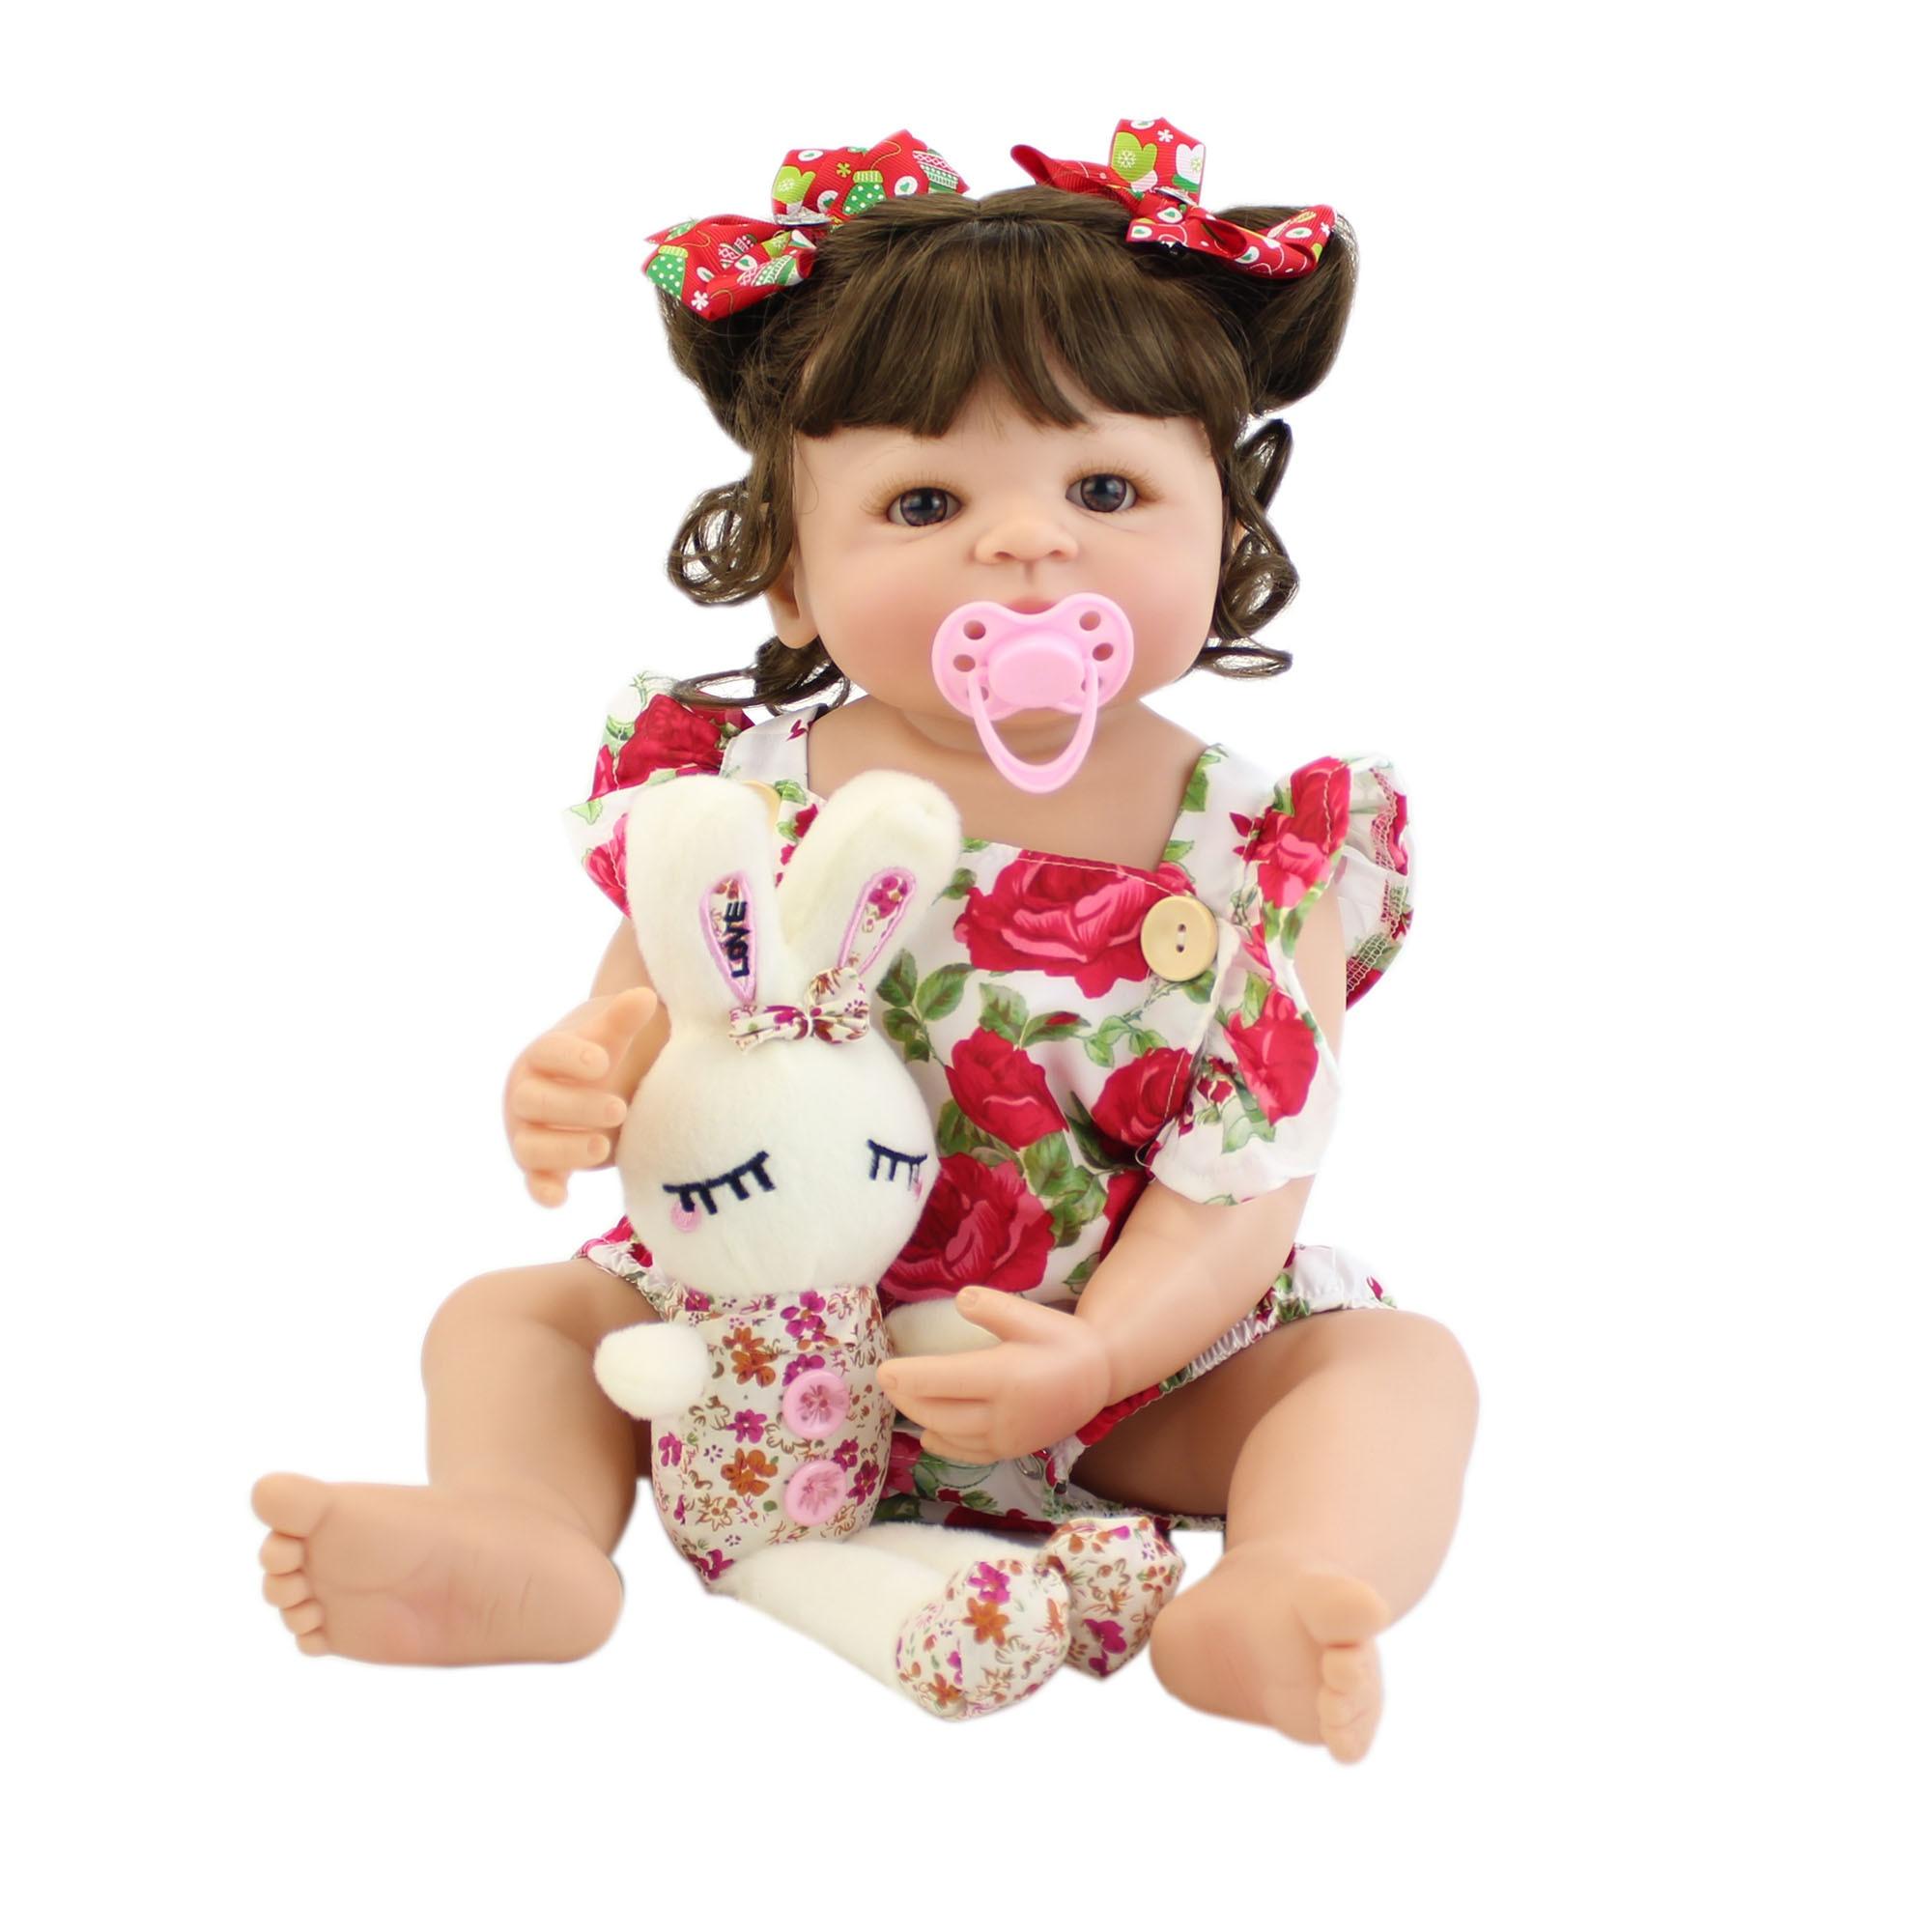 55cm Full Silicone Body Reborn Baby Doll Toy For Girl Vinyl Newborn Princess Babies Bebe Bathe